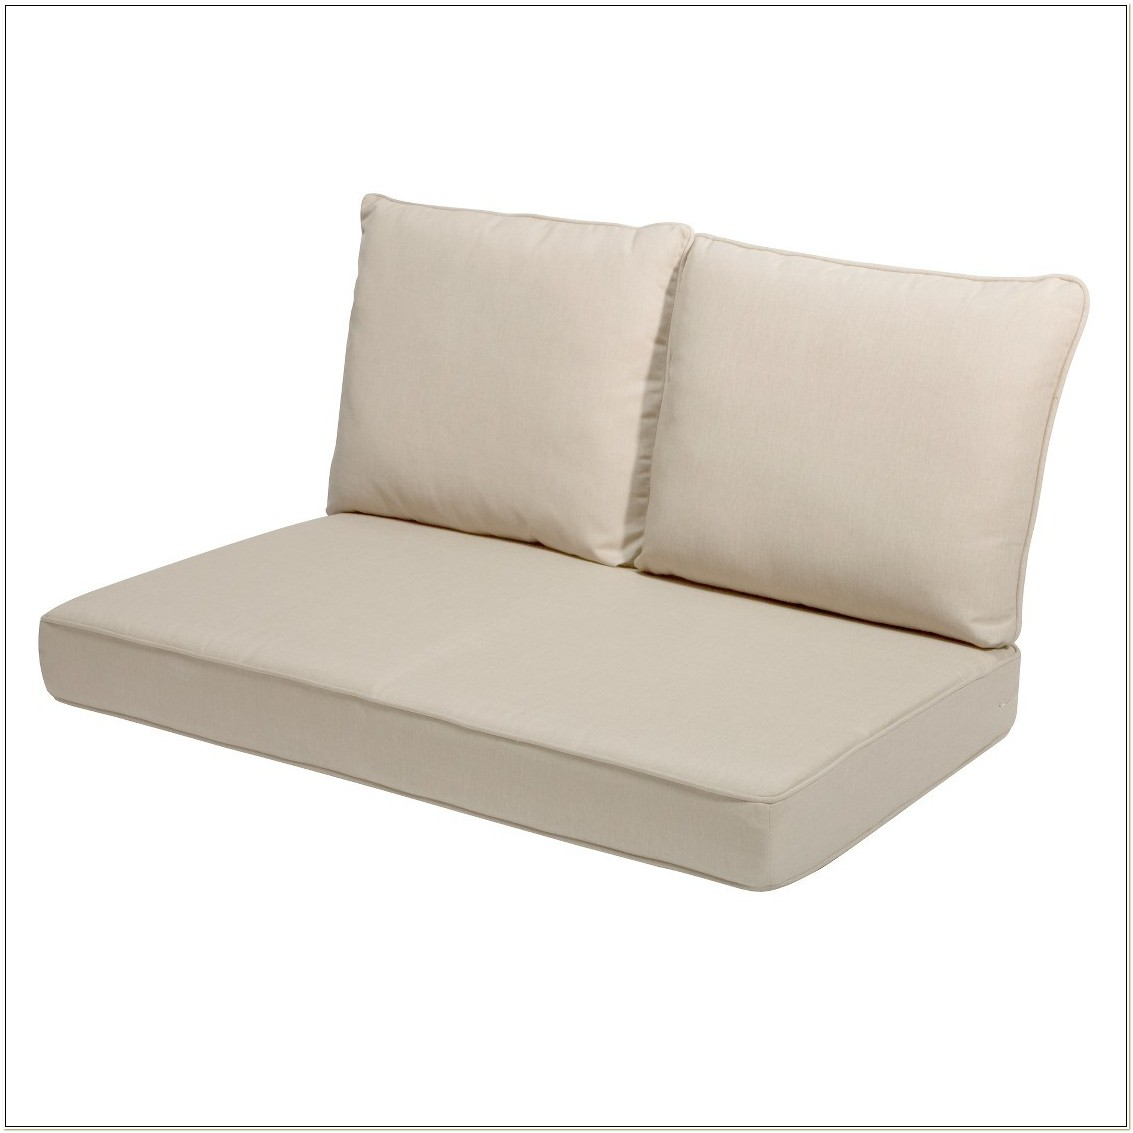 Loveseat And Chair Cushion Set